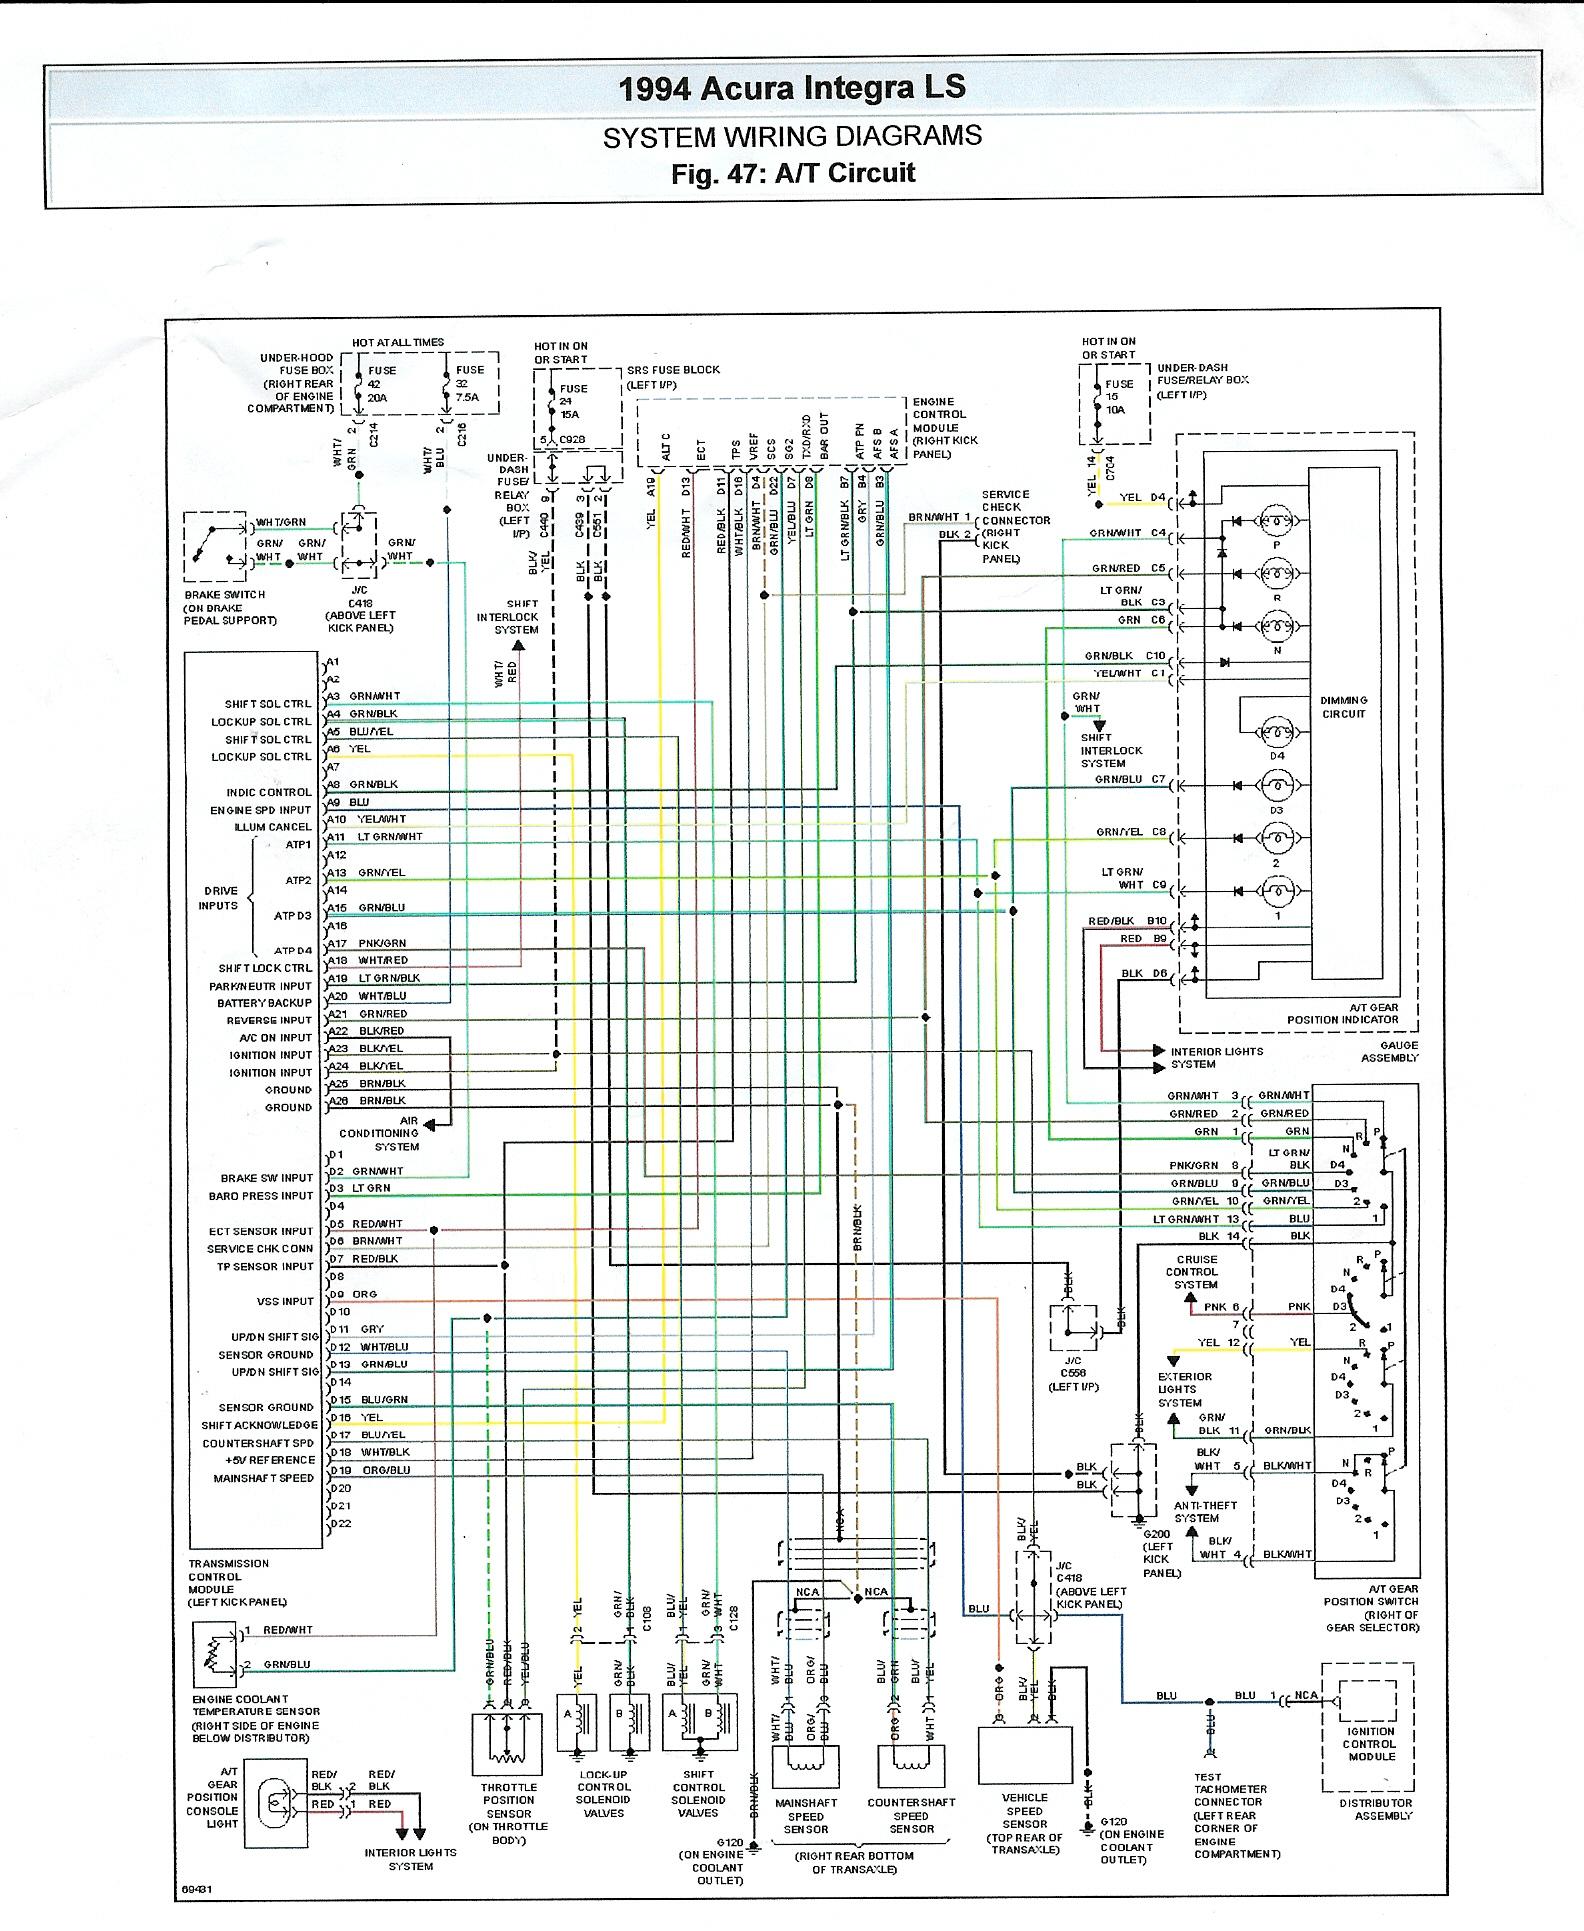 Volvo B18 Engine Diagram Integra Tcm Wiring Schematic For Auto Swap Honda Tech